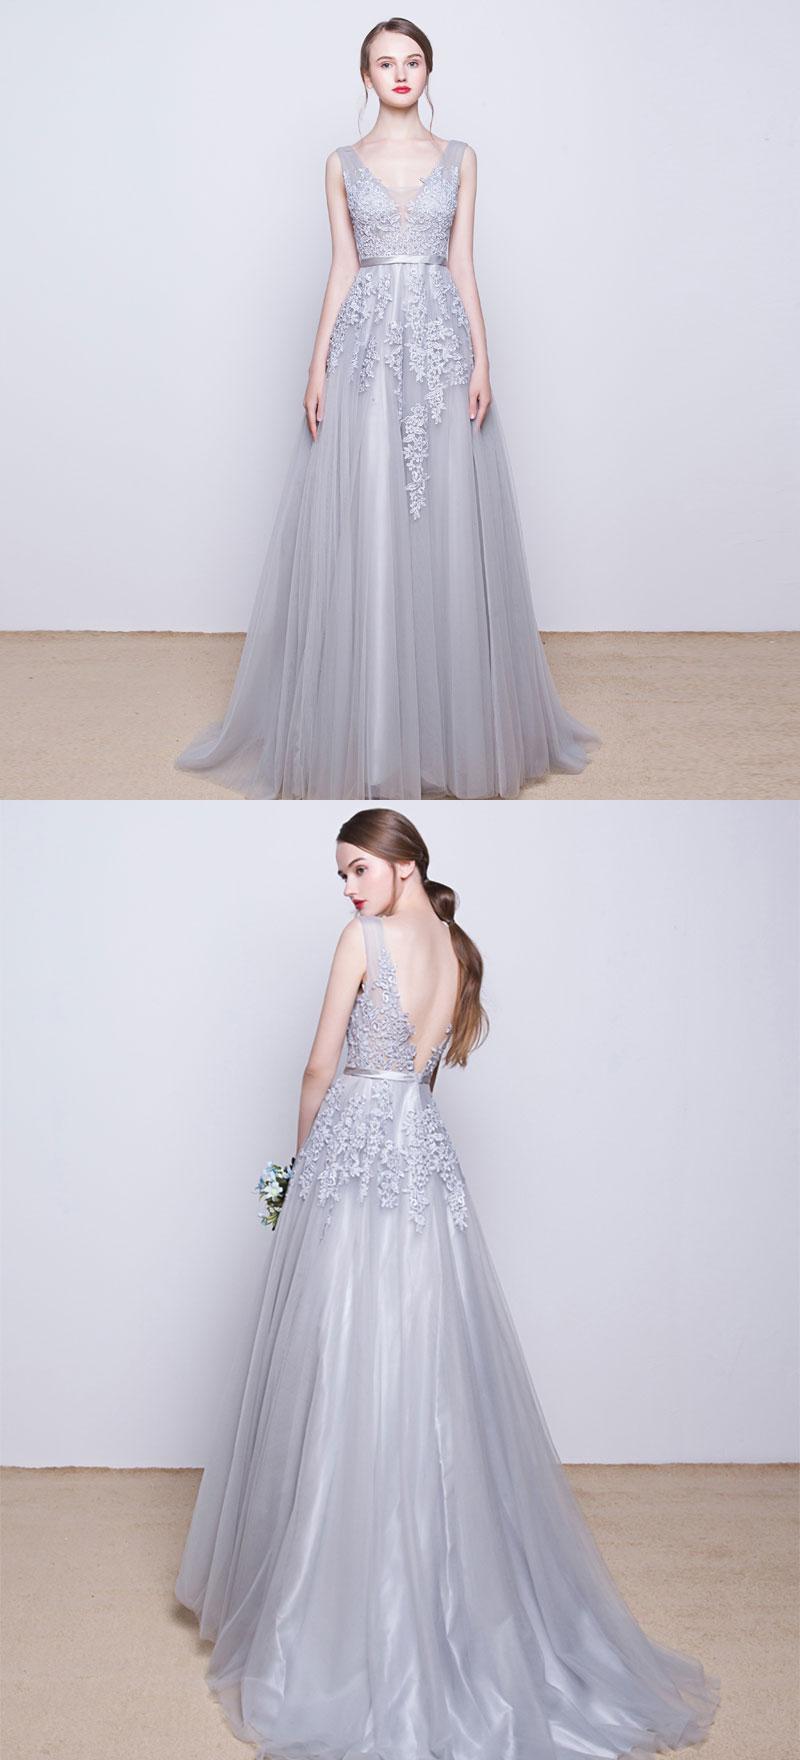 1acac1e654 ... Gray v neck tulle lace long prom dress